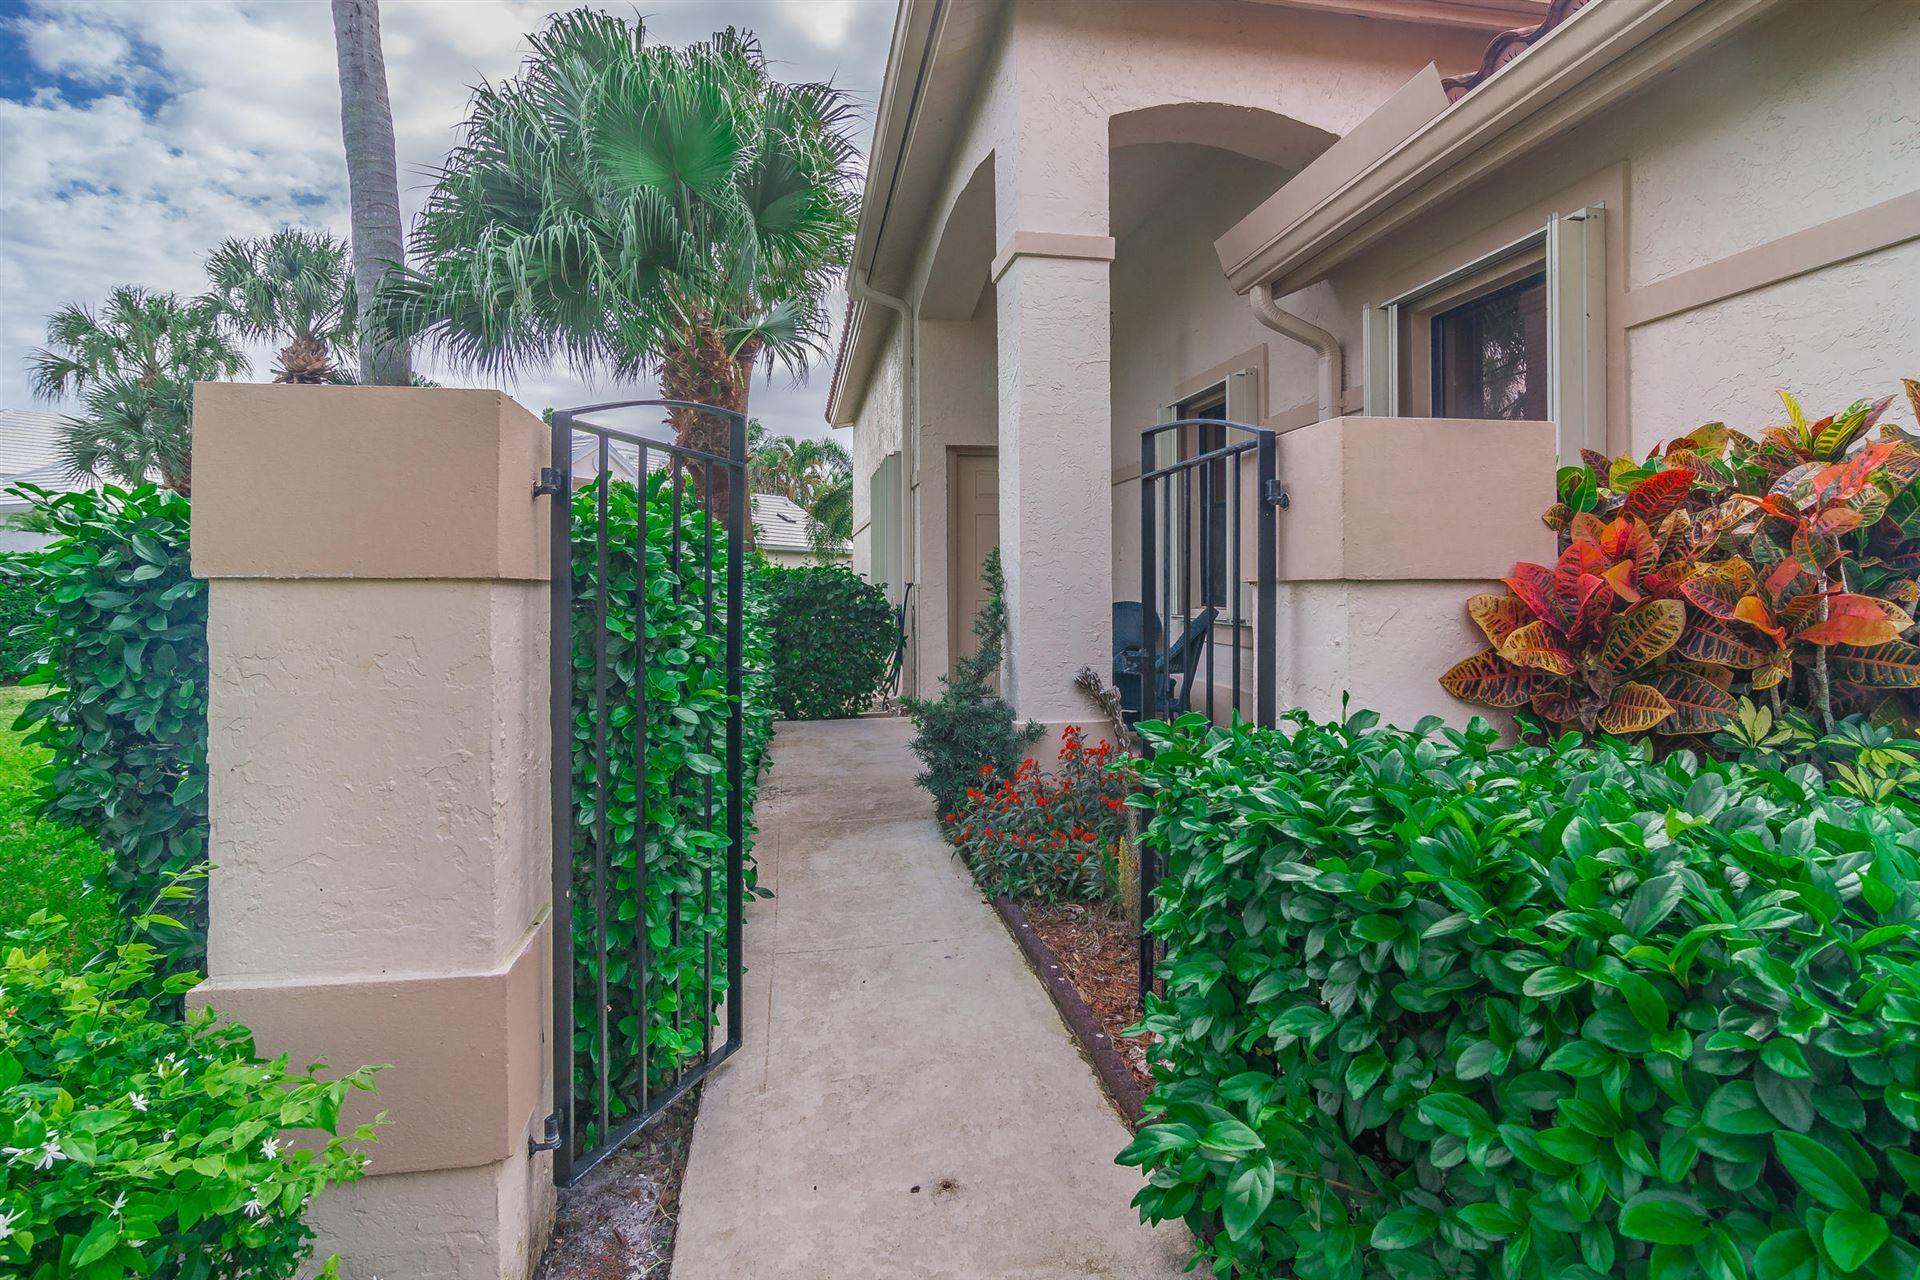 Photo of 882 Windermere Way, Palm Beach Gardens, FL 33418 (MLS # RX-10591884)